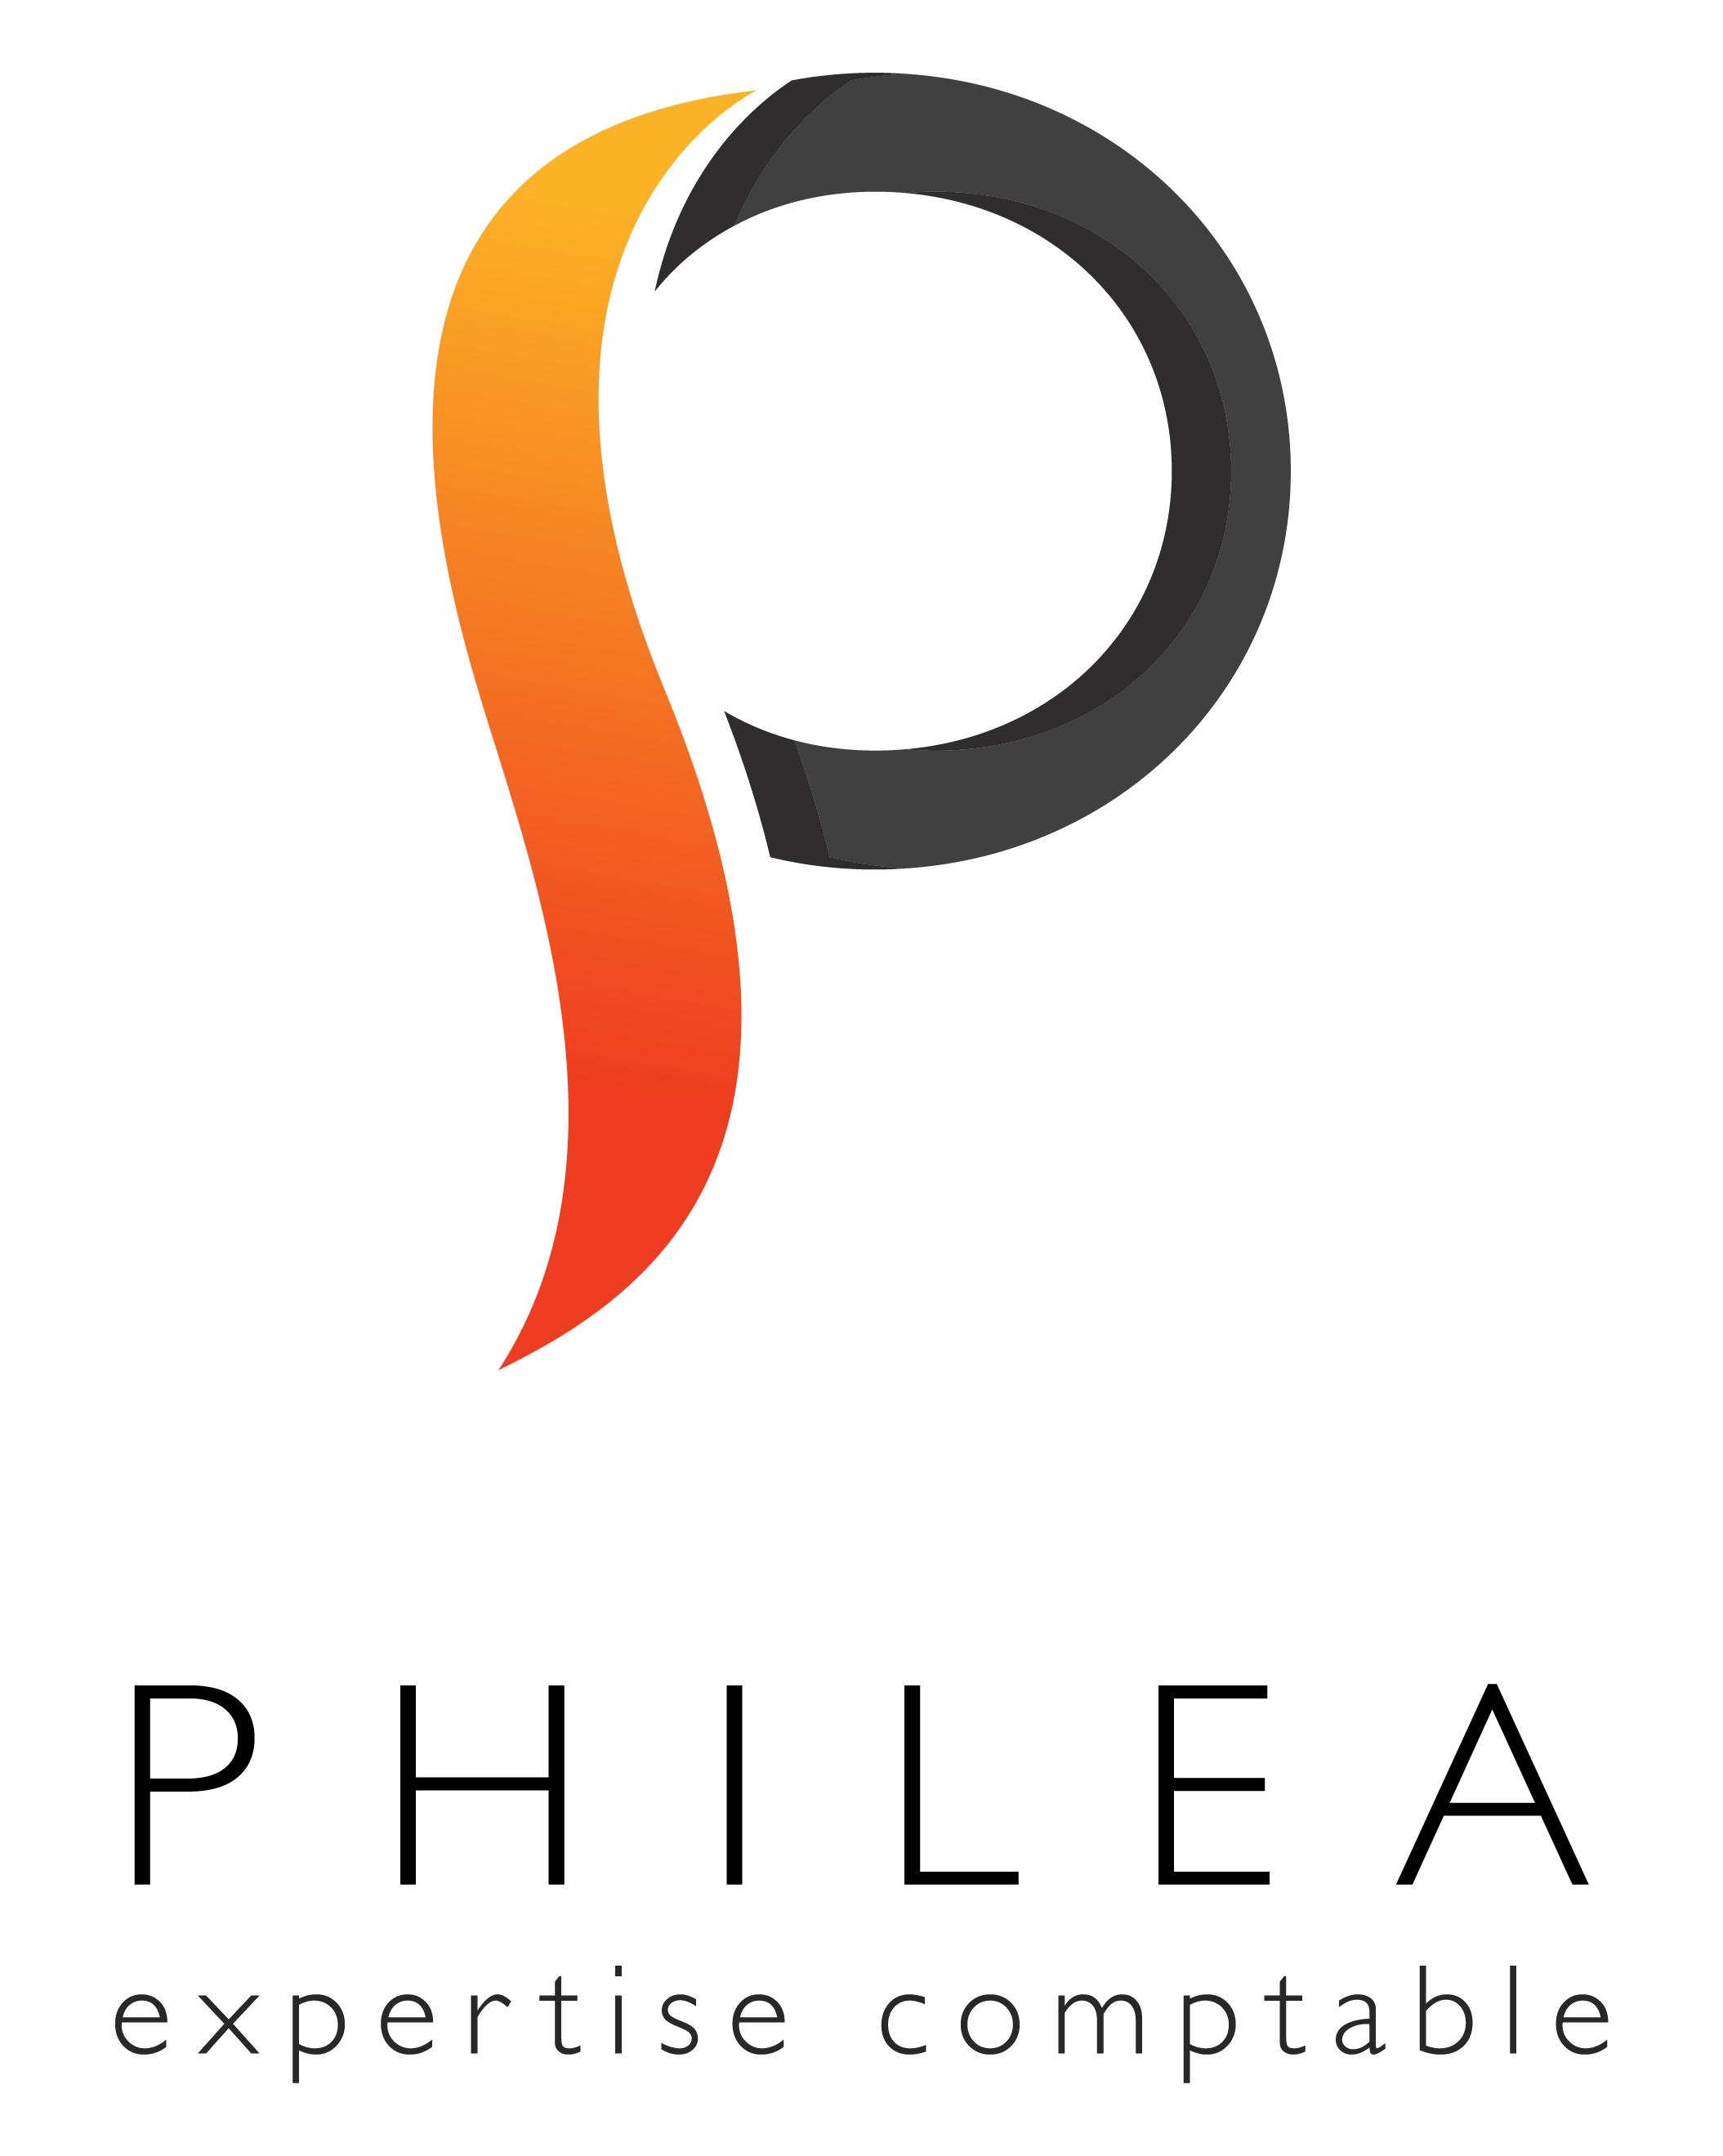 PHILEA EXPERTISE